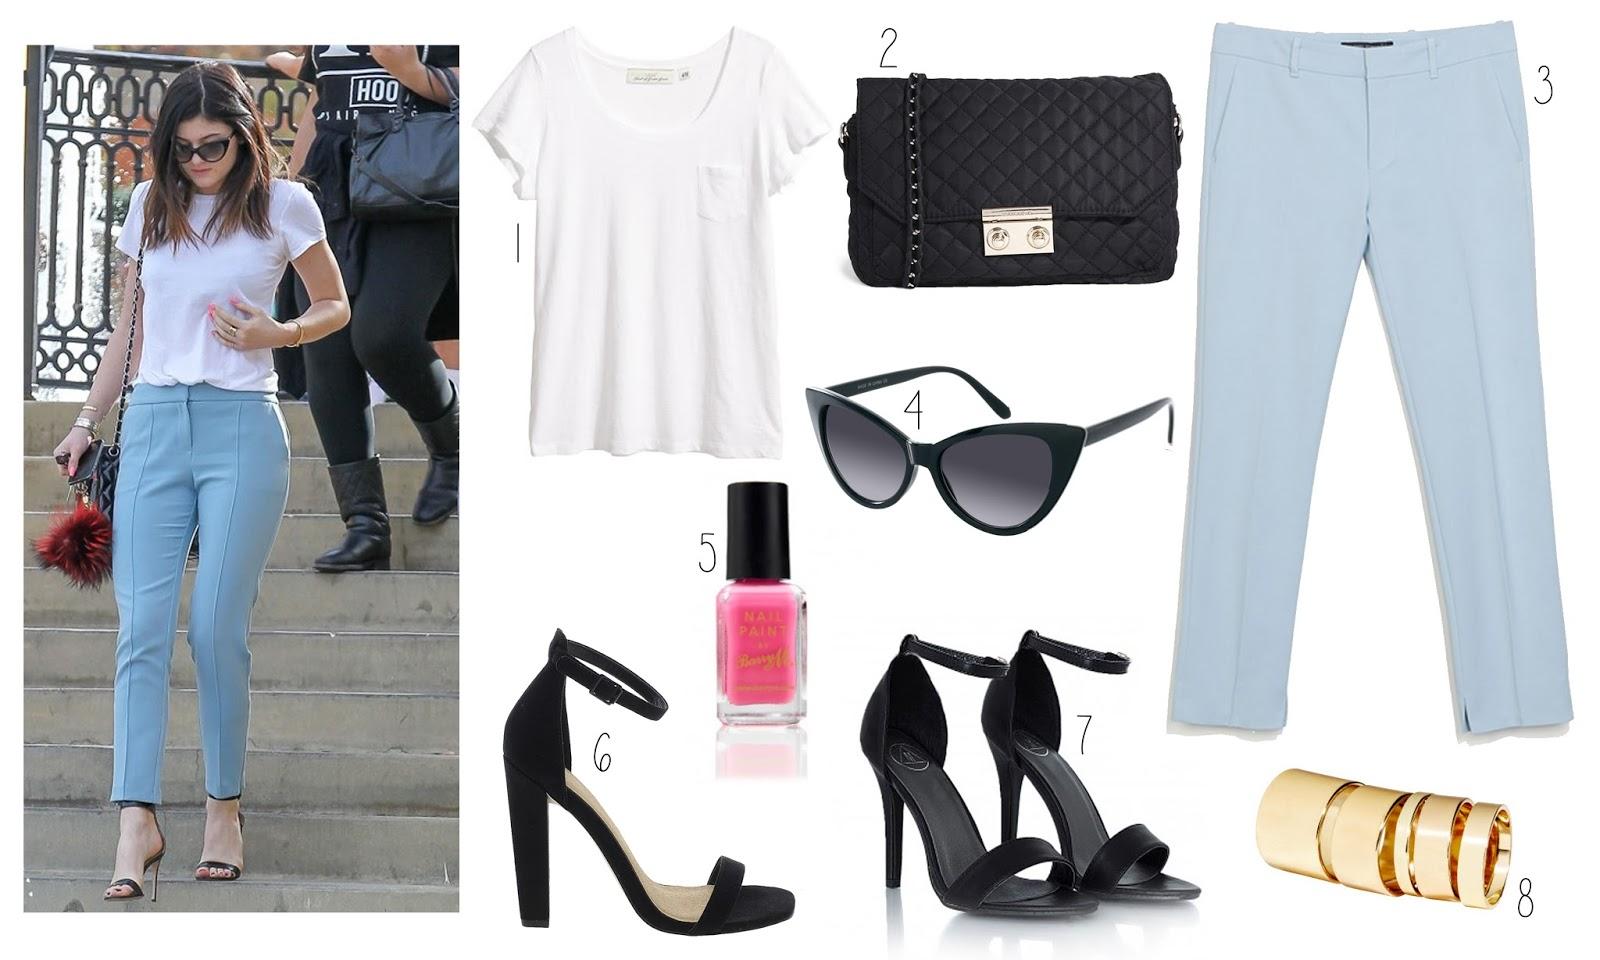 Steal Her Style Kylie Jenner 1600 960 Kylie Jenner Inspired Pinterest